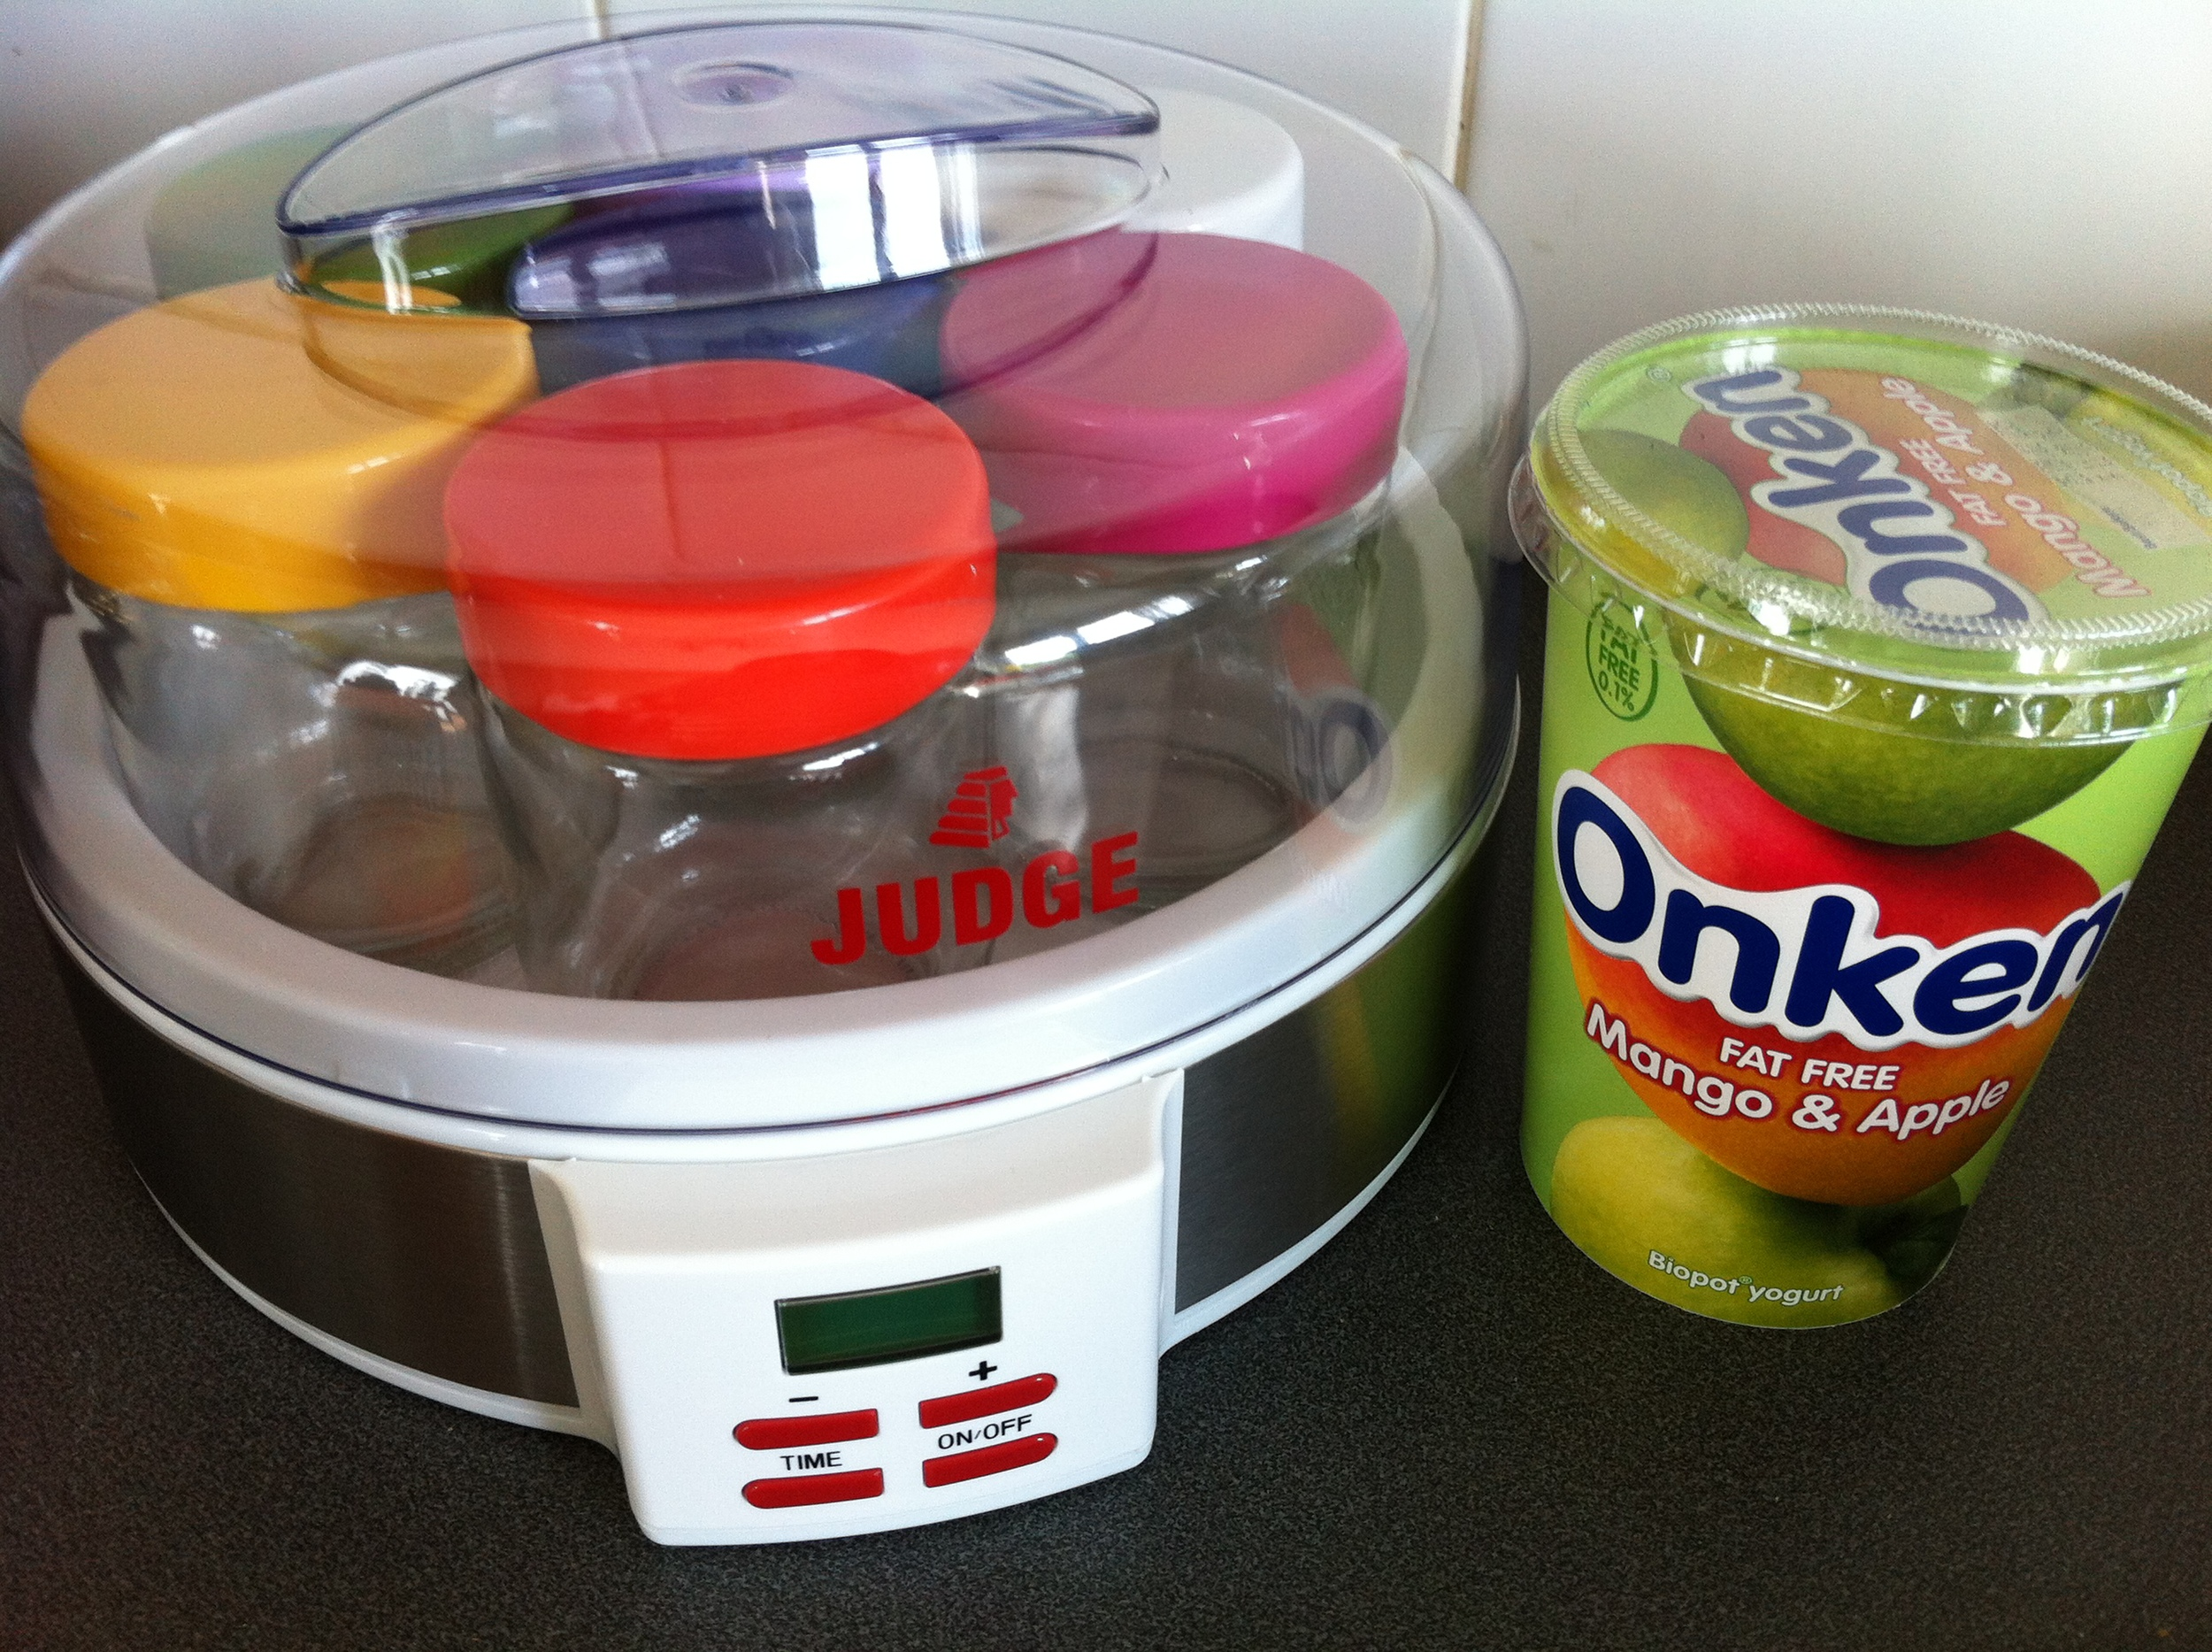 Rainbow Coloured Digital Yoghurt Maker from Judge